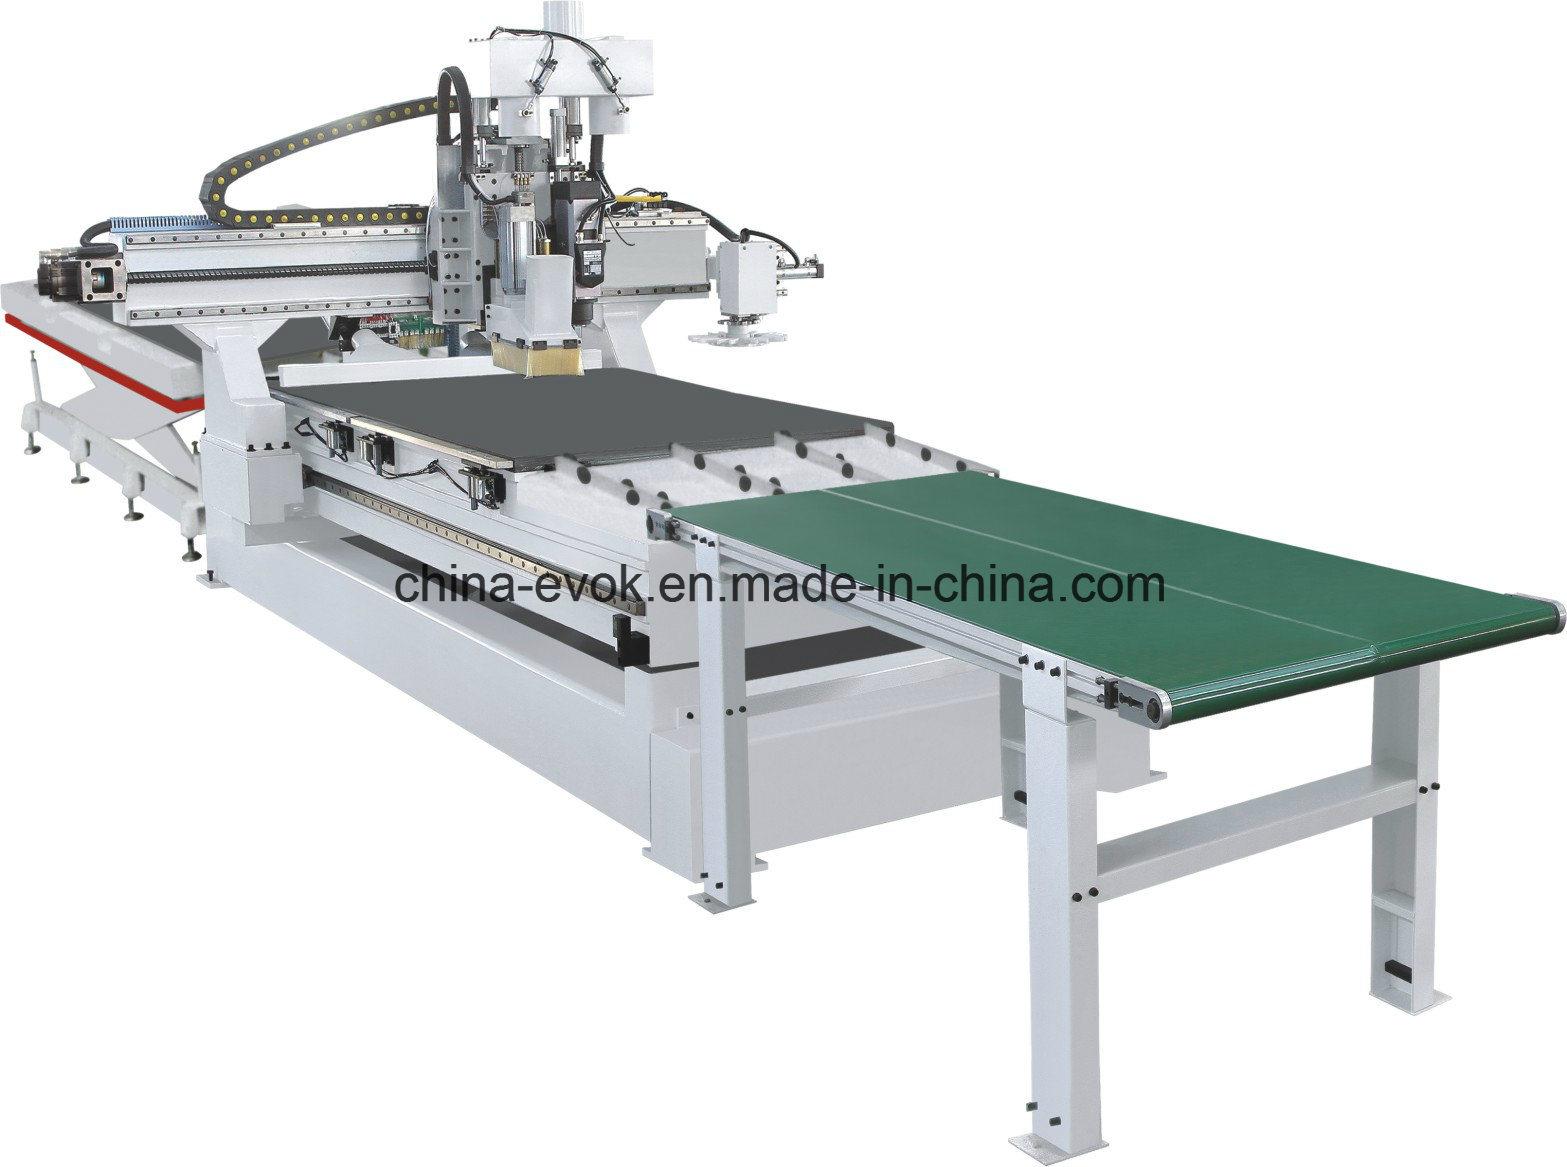 Router CNC Cortar&gravura a máquina para a indústria da madeira Mg-2412C2